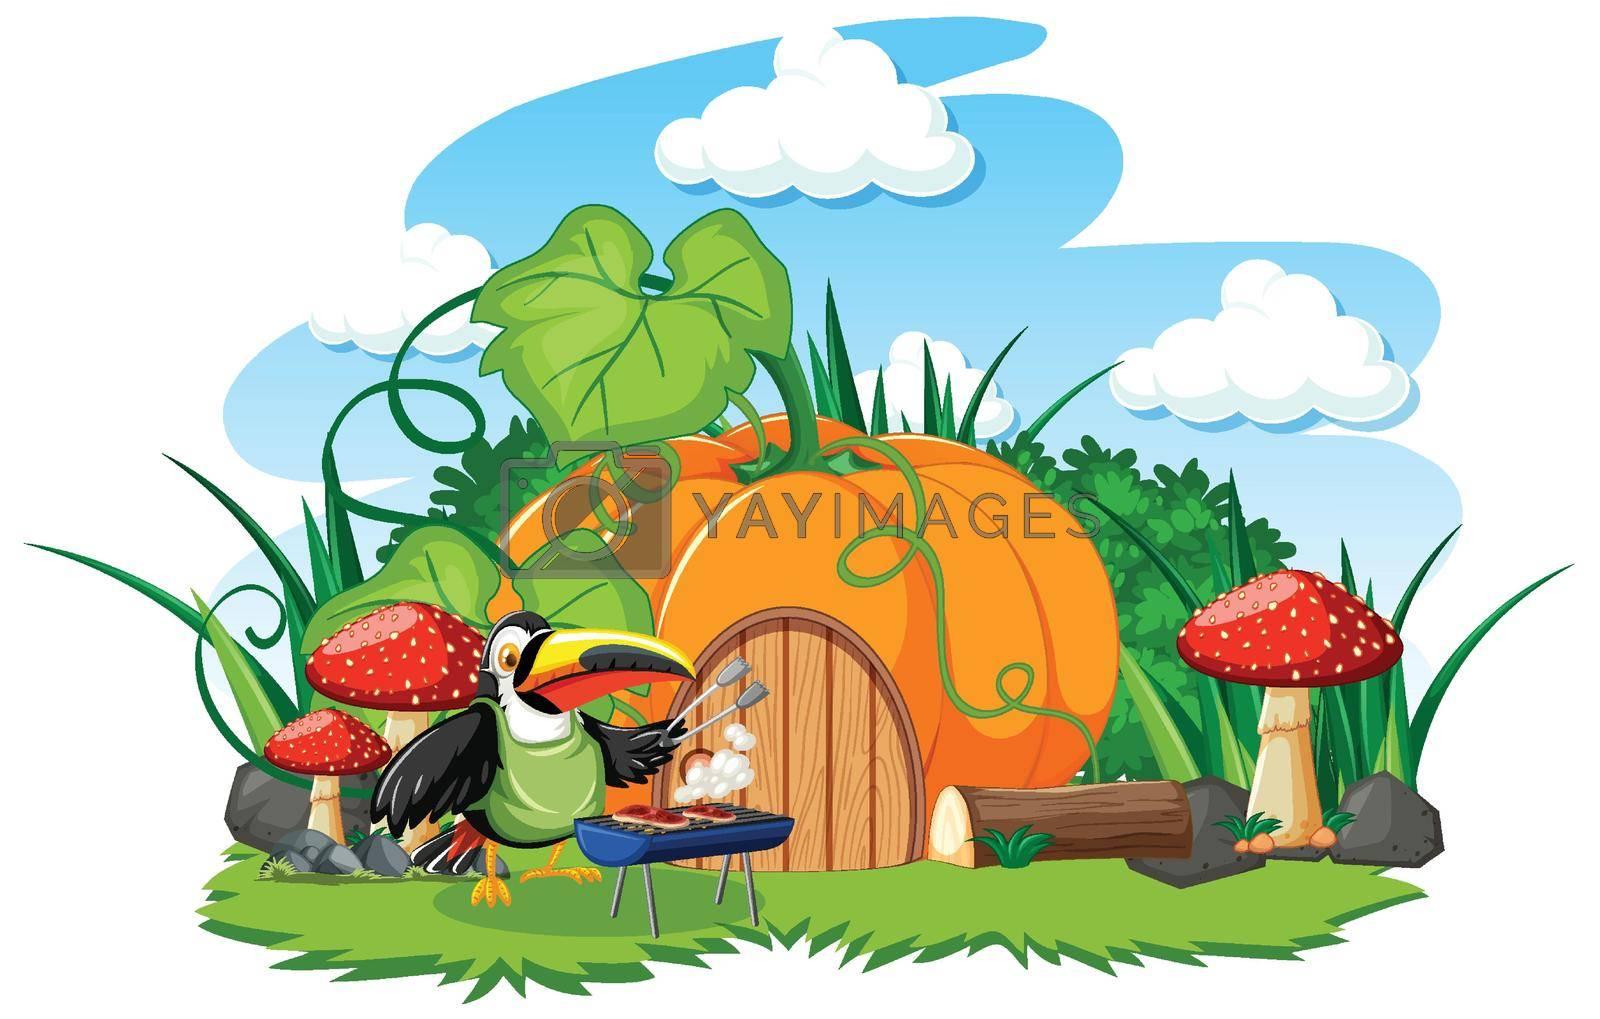 Pumpkin house with cute bird cartoon style on white background illustration